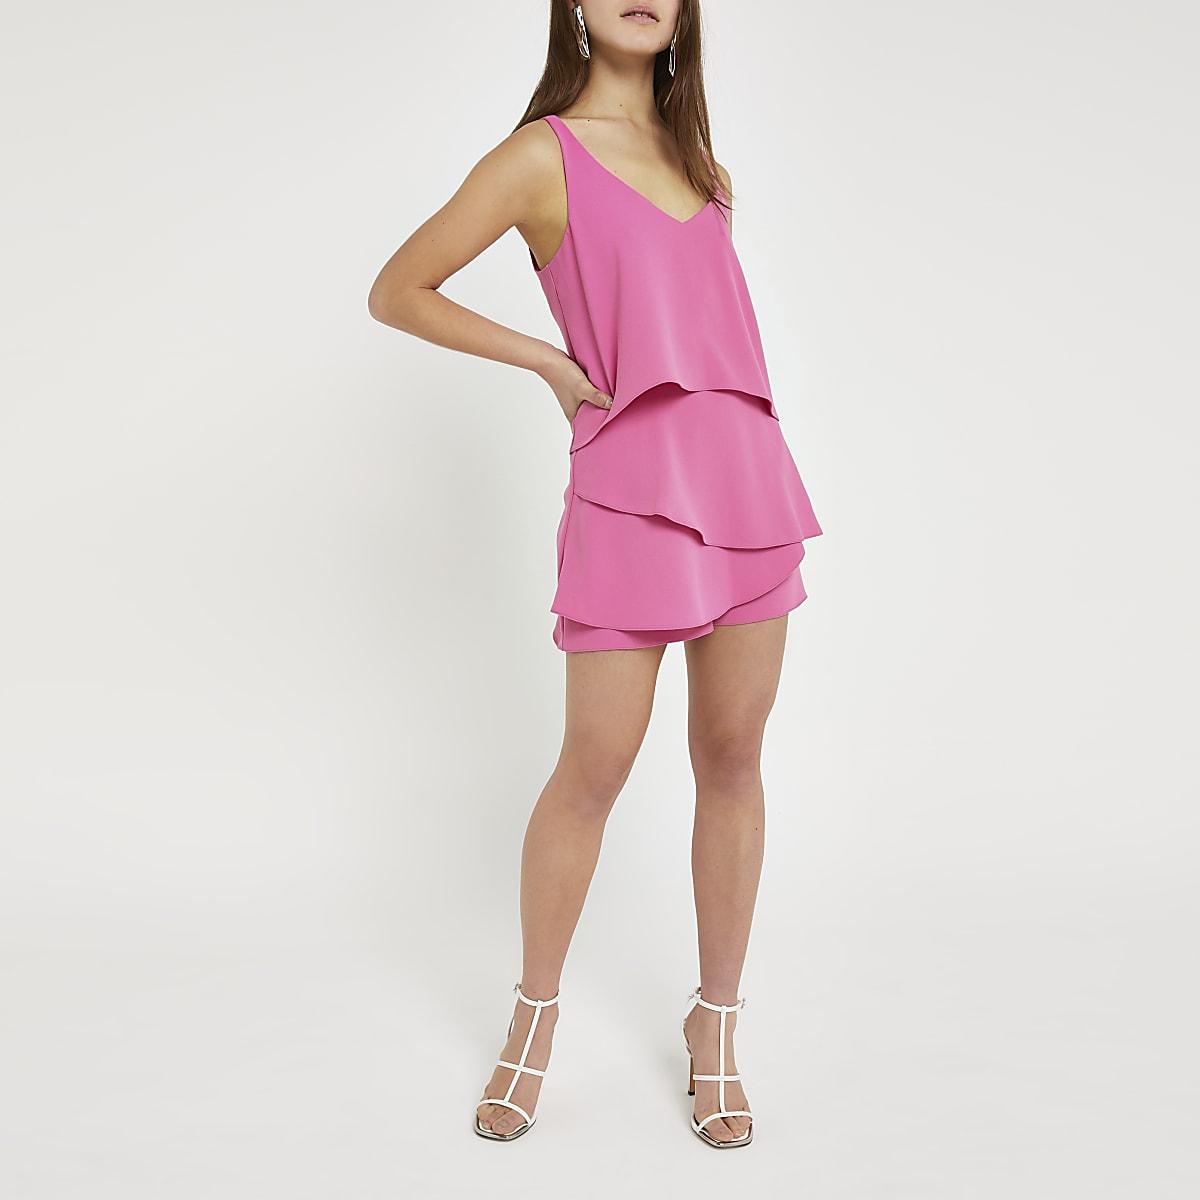 Petite pink layered frill playsuit